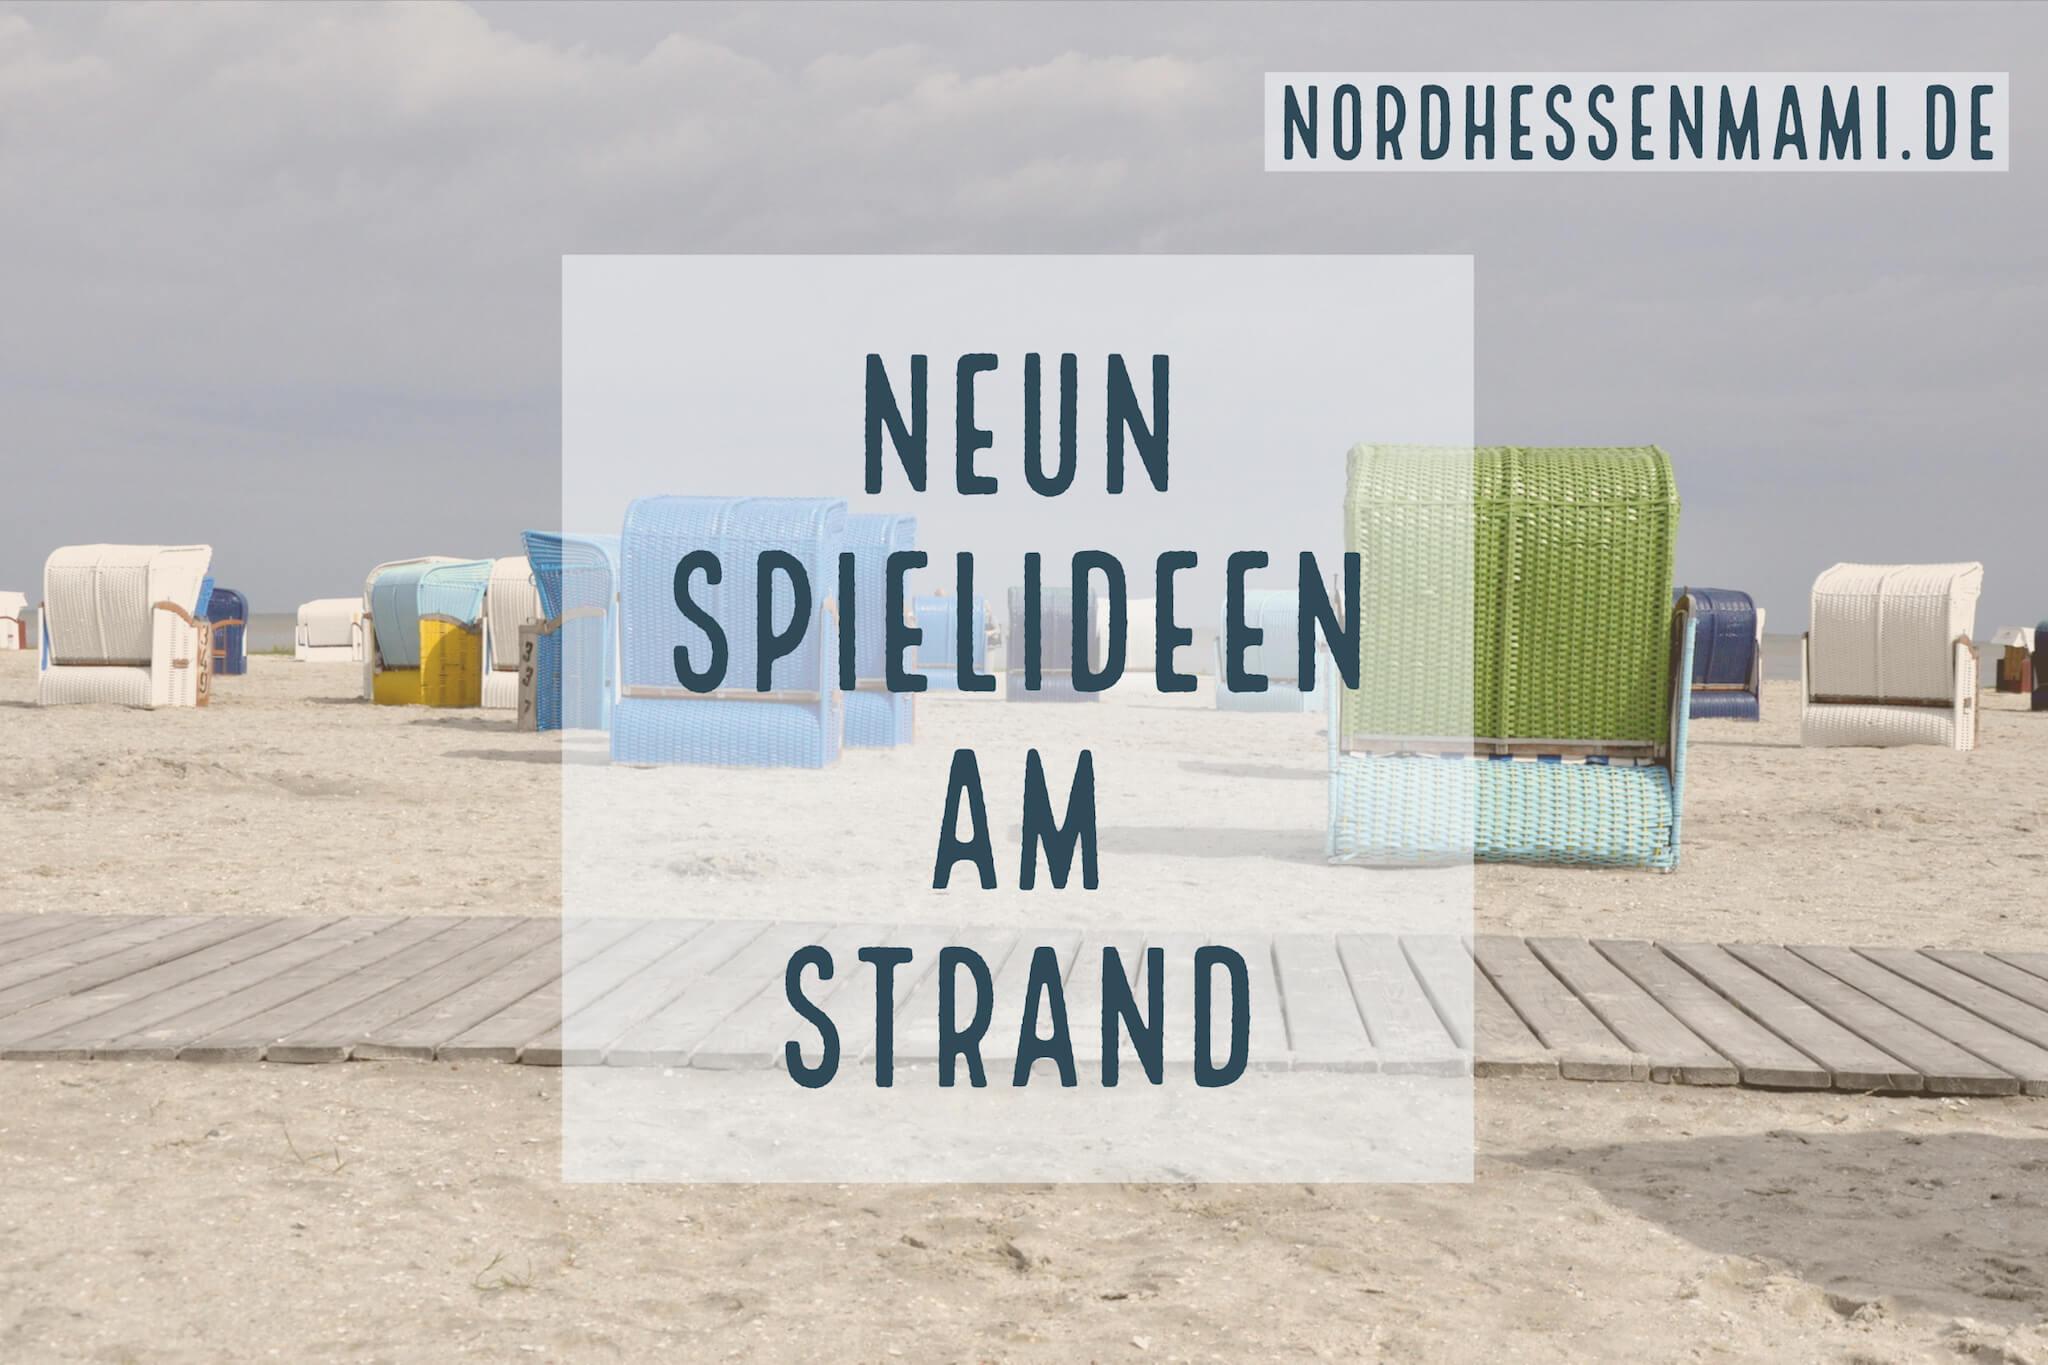 180626-Spielideenamstrand-01